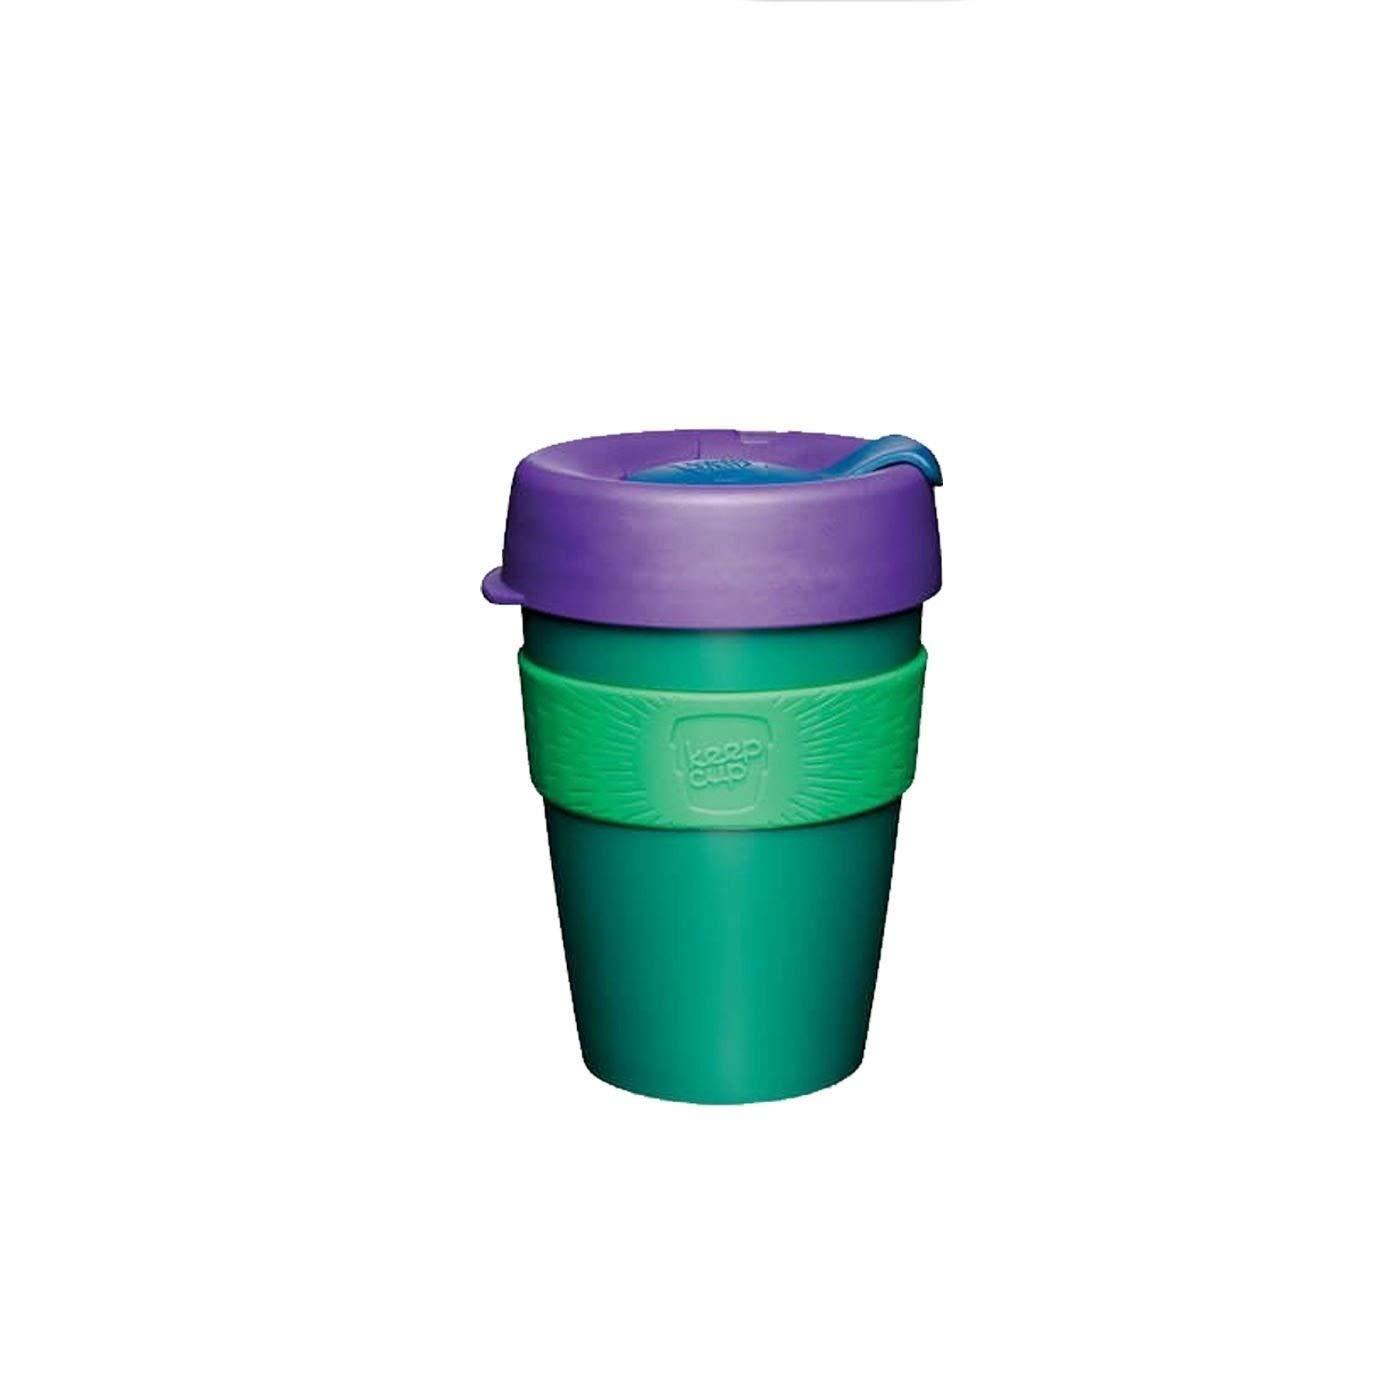 KeepCup Changemakers Original Natural 8oz Travel Mug